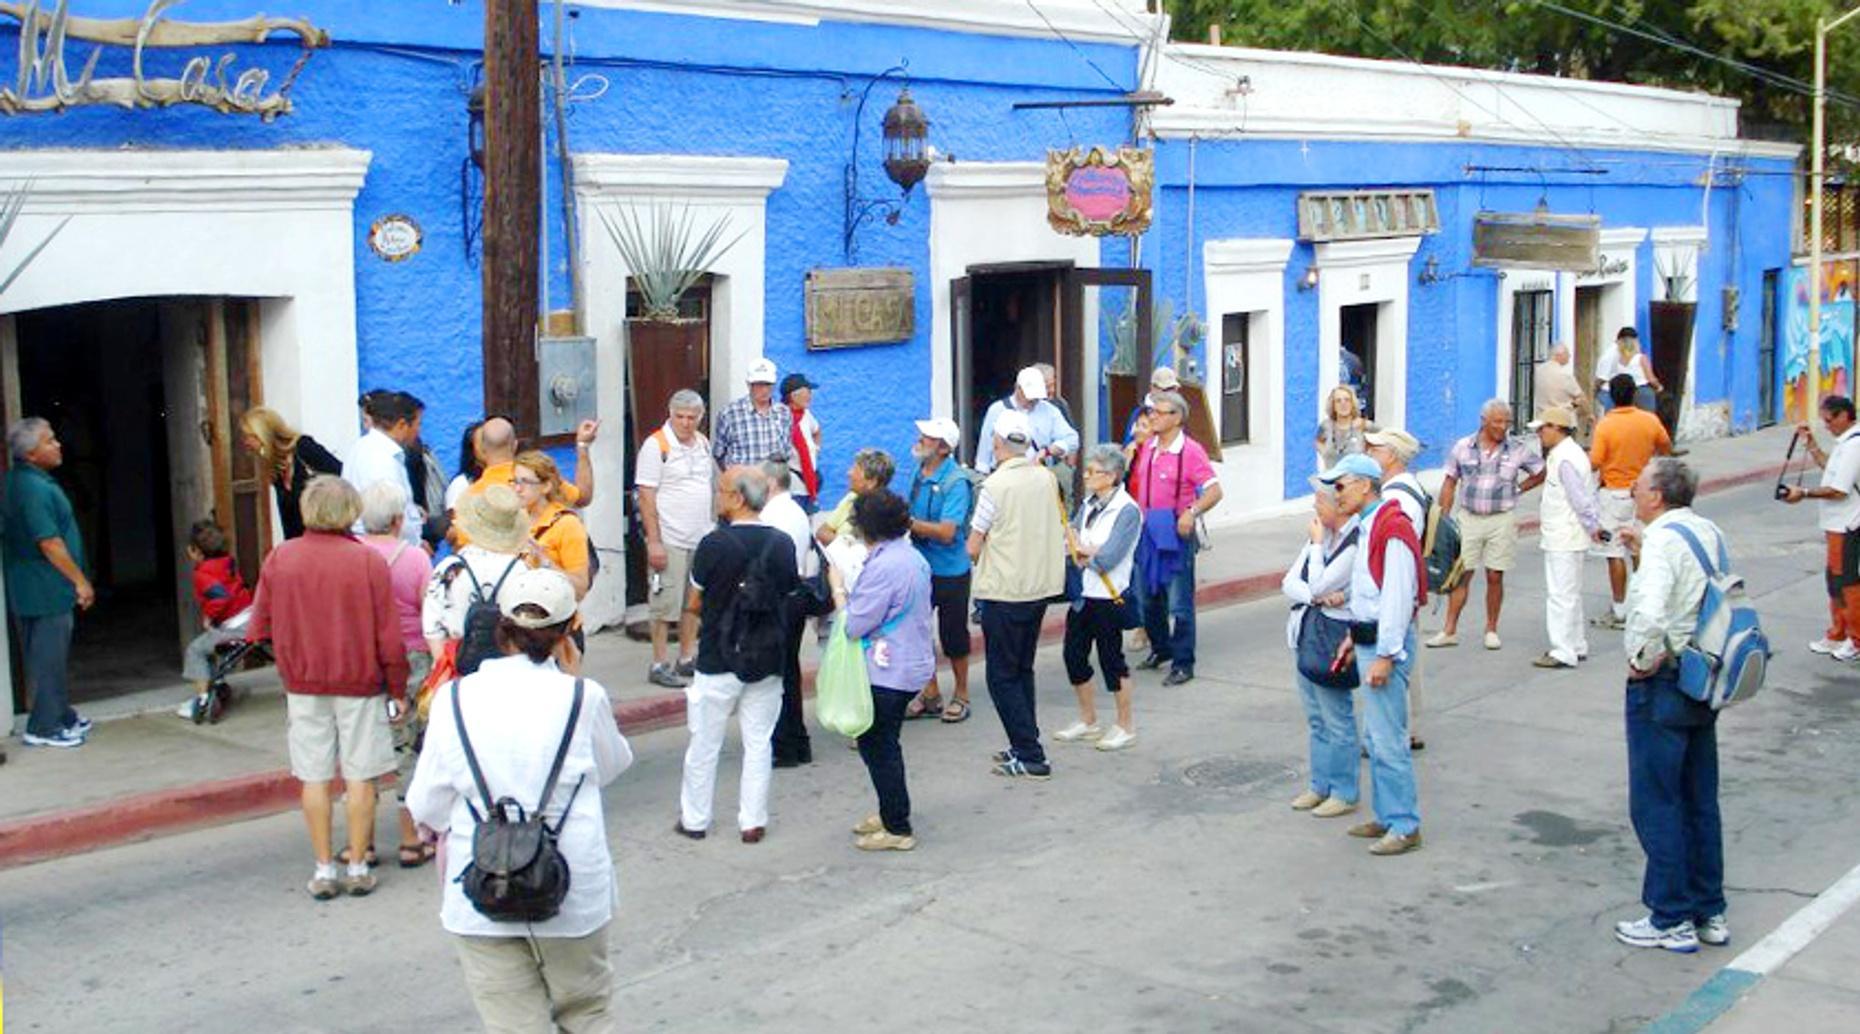 Market and San José City Tour